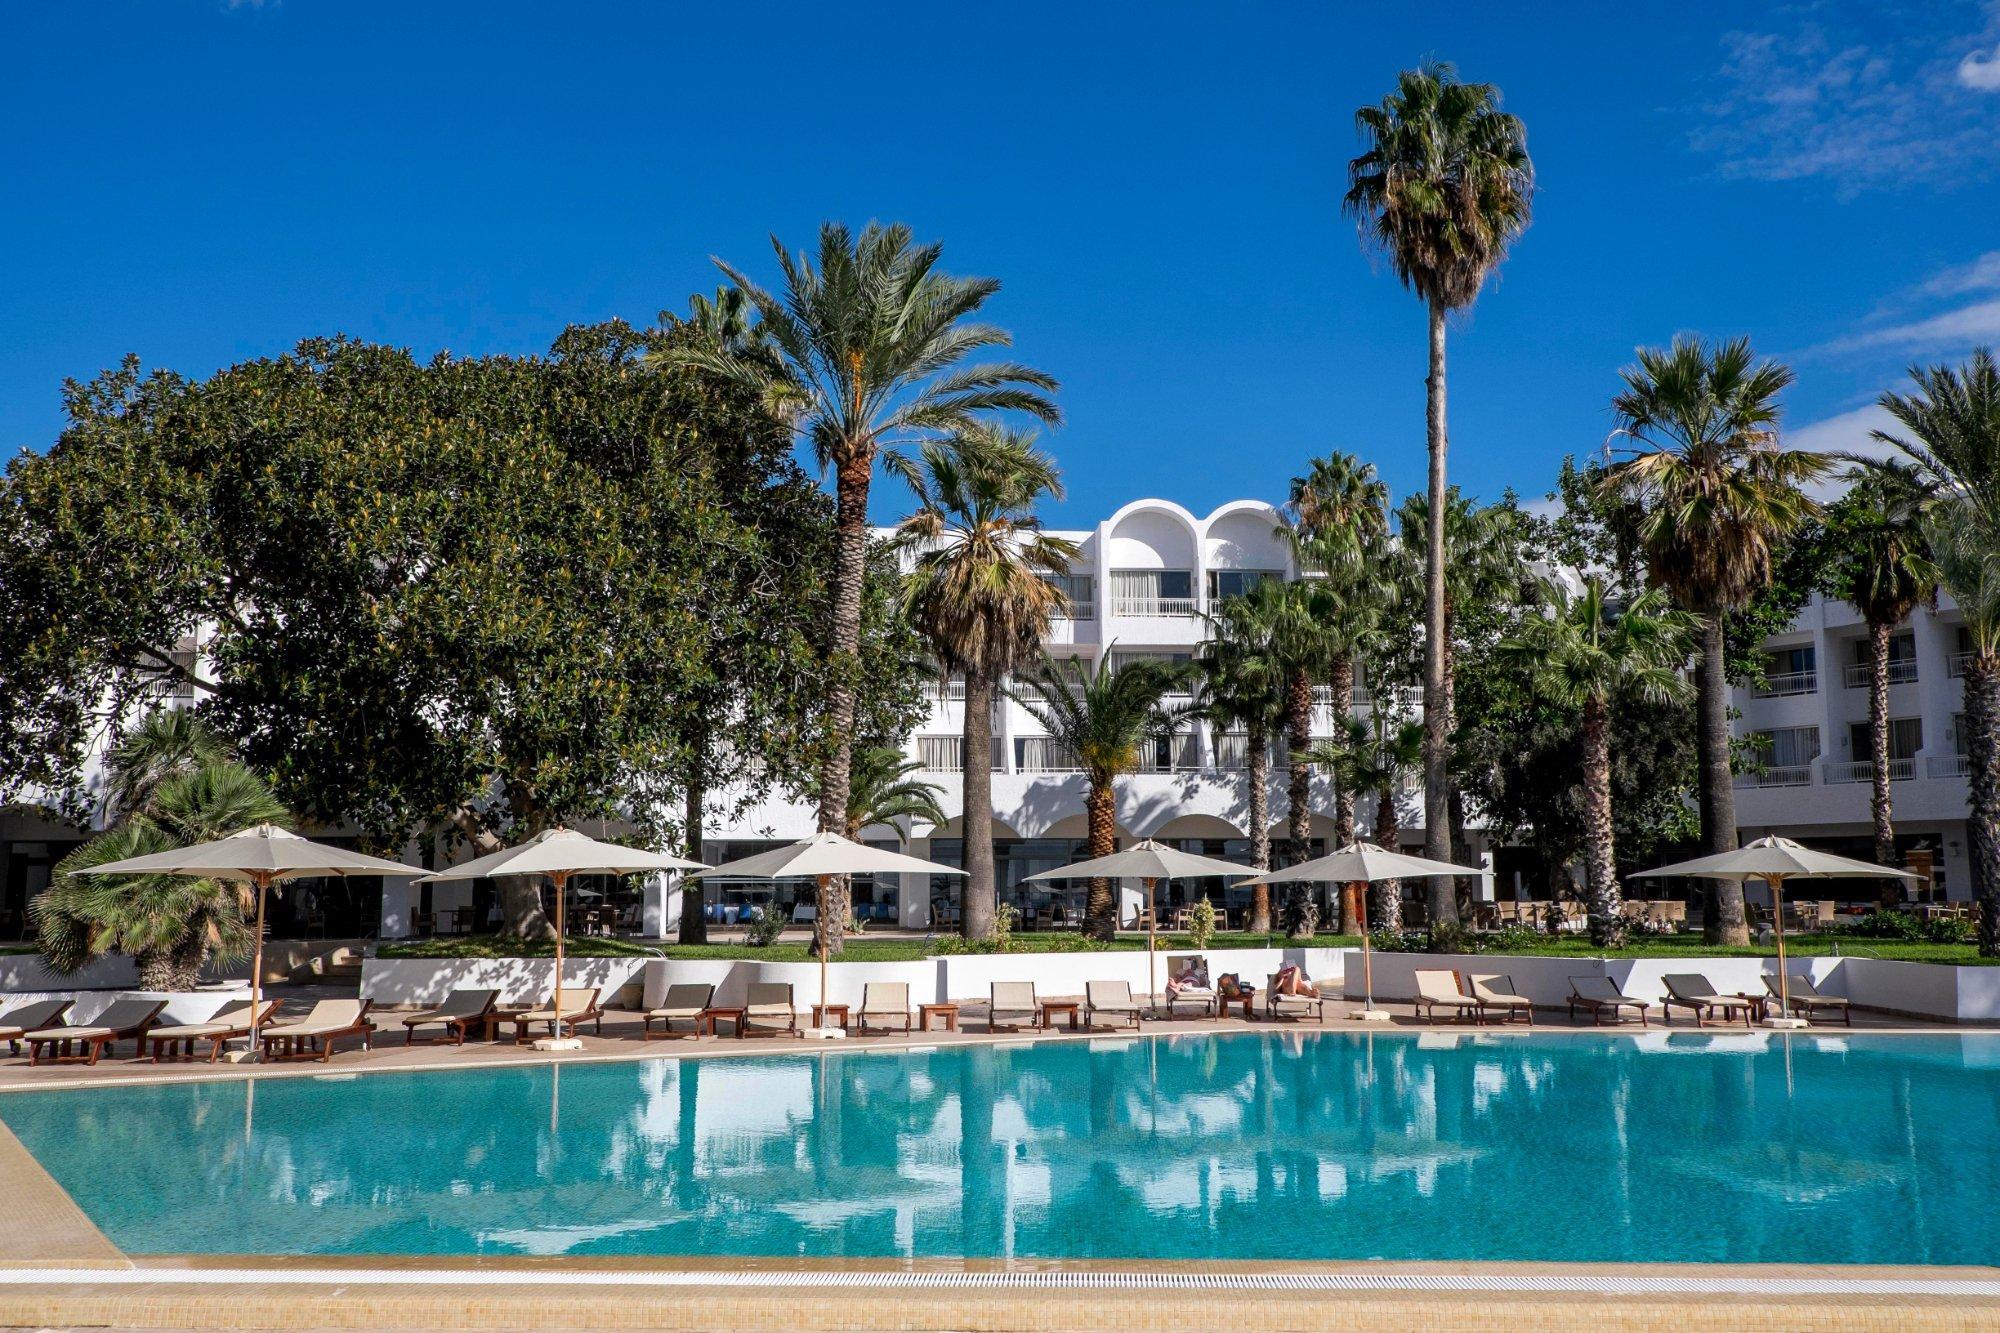 Bel Azur Thalasso & Bugalows Hotel